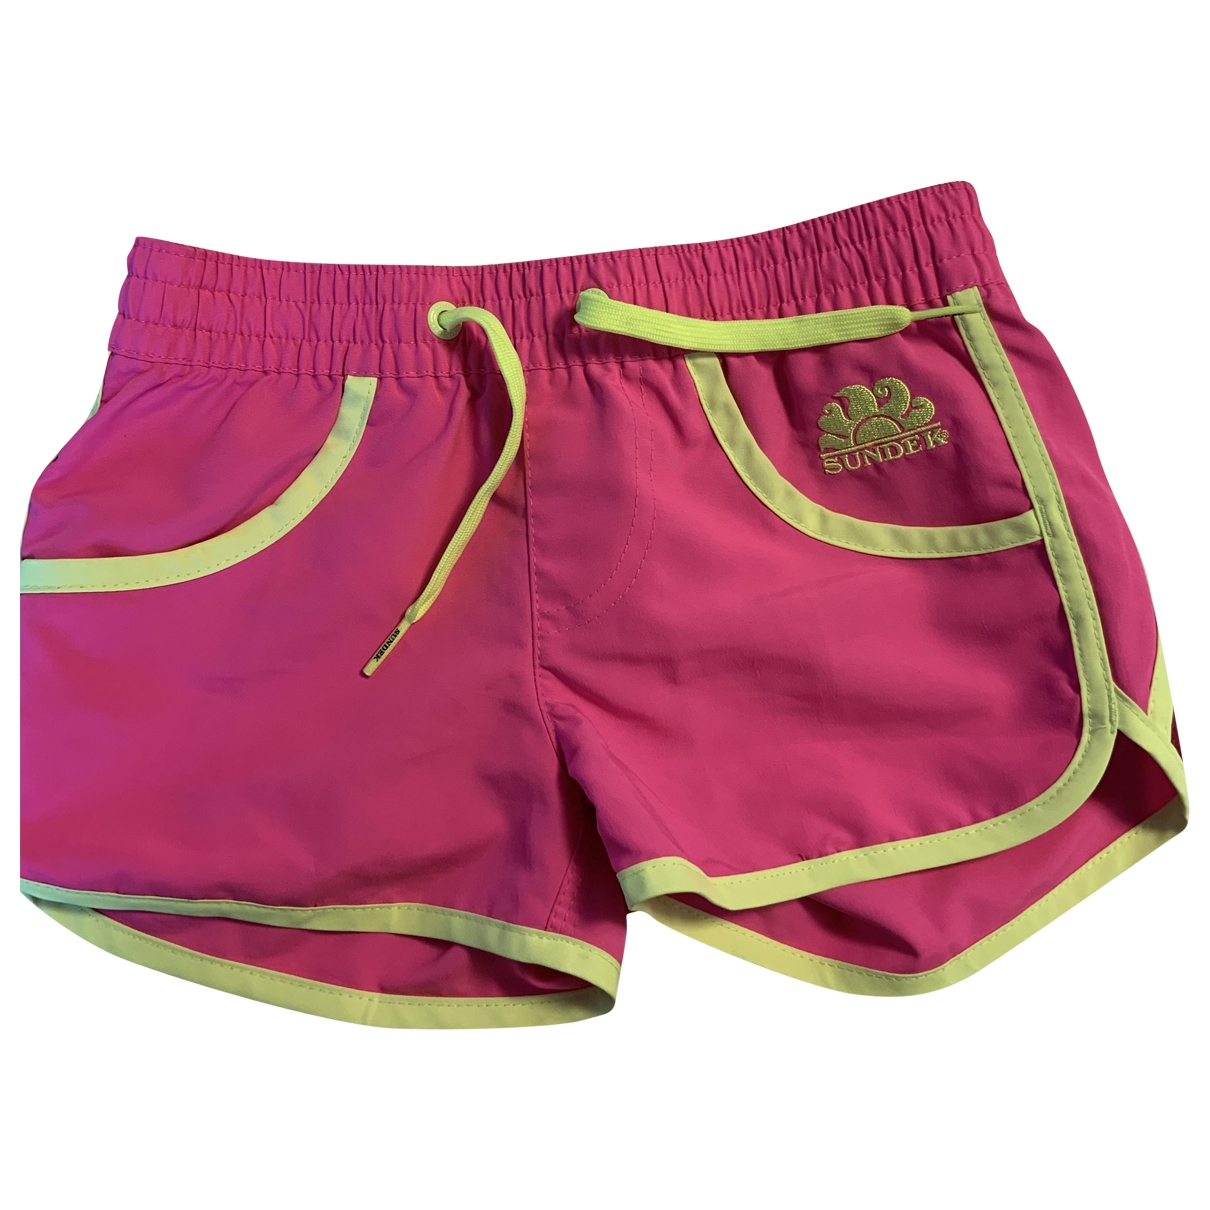 Sundek \N Pink Shorts for Kids 8 years - up to 128cm FR